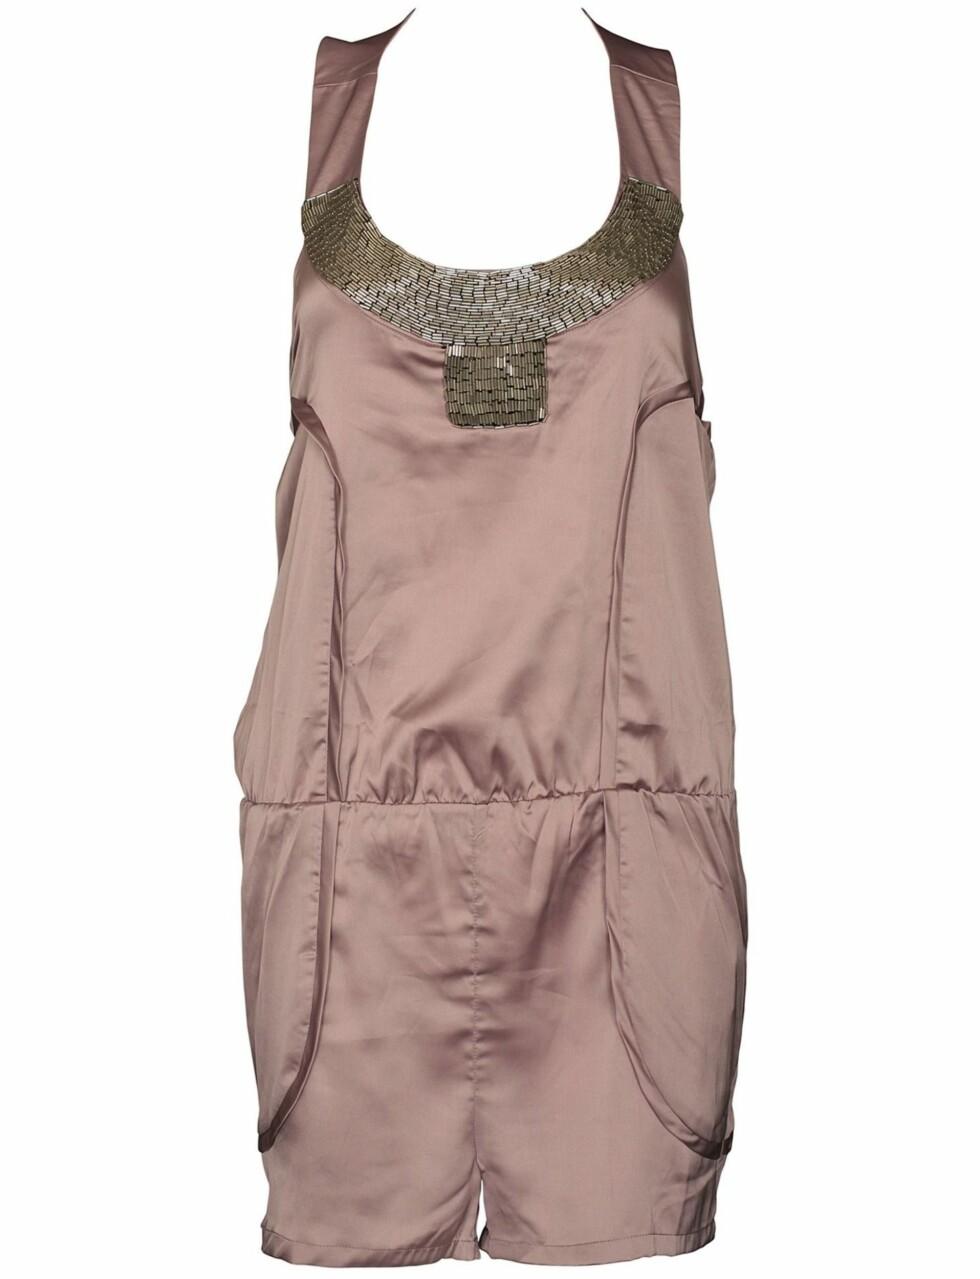 I silke med figursydde sømmer og steinpynt (kr 350, Rare Fashion/Fashionmixology).